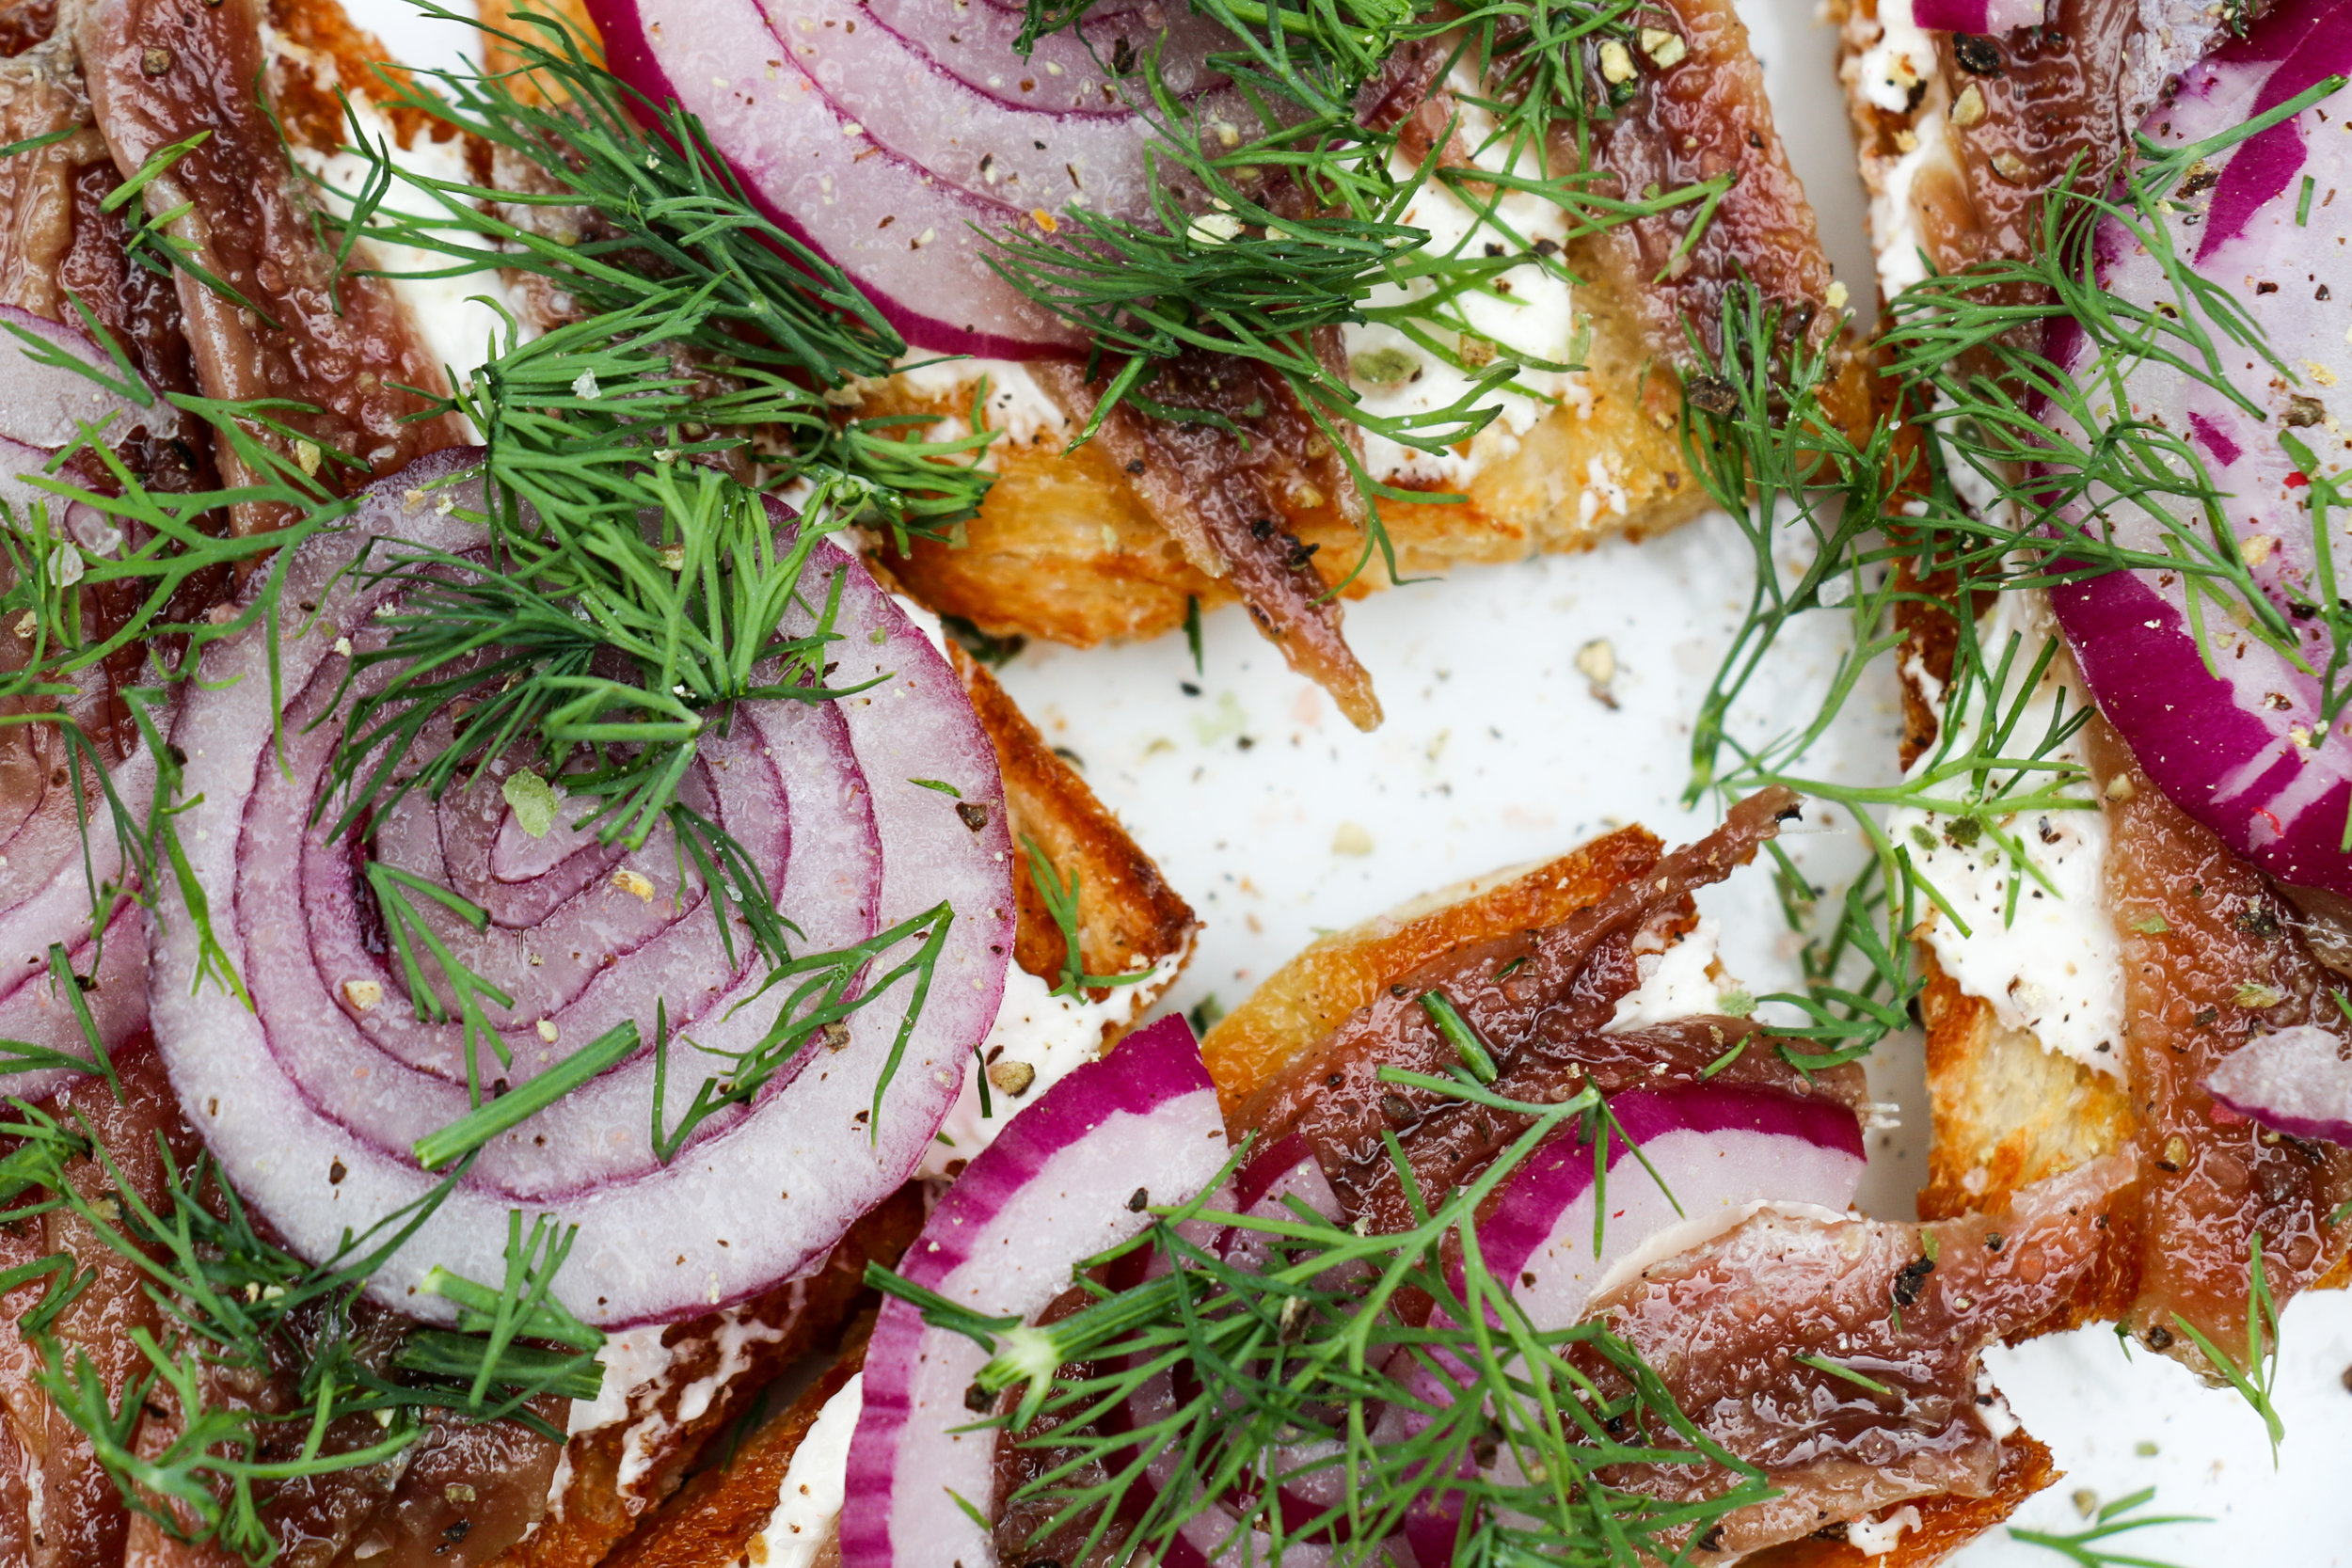 clean-slate-cookbook-martha-stewart-sardines-and-cream-cheese-on-rye-sandwhich